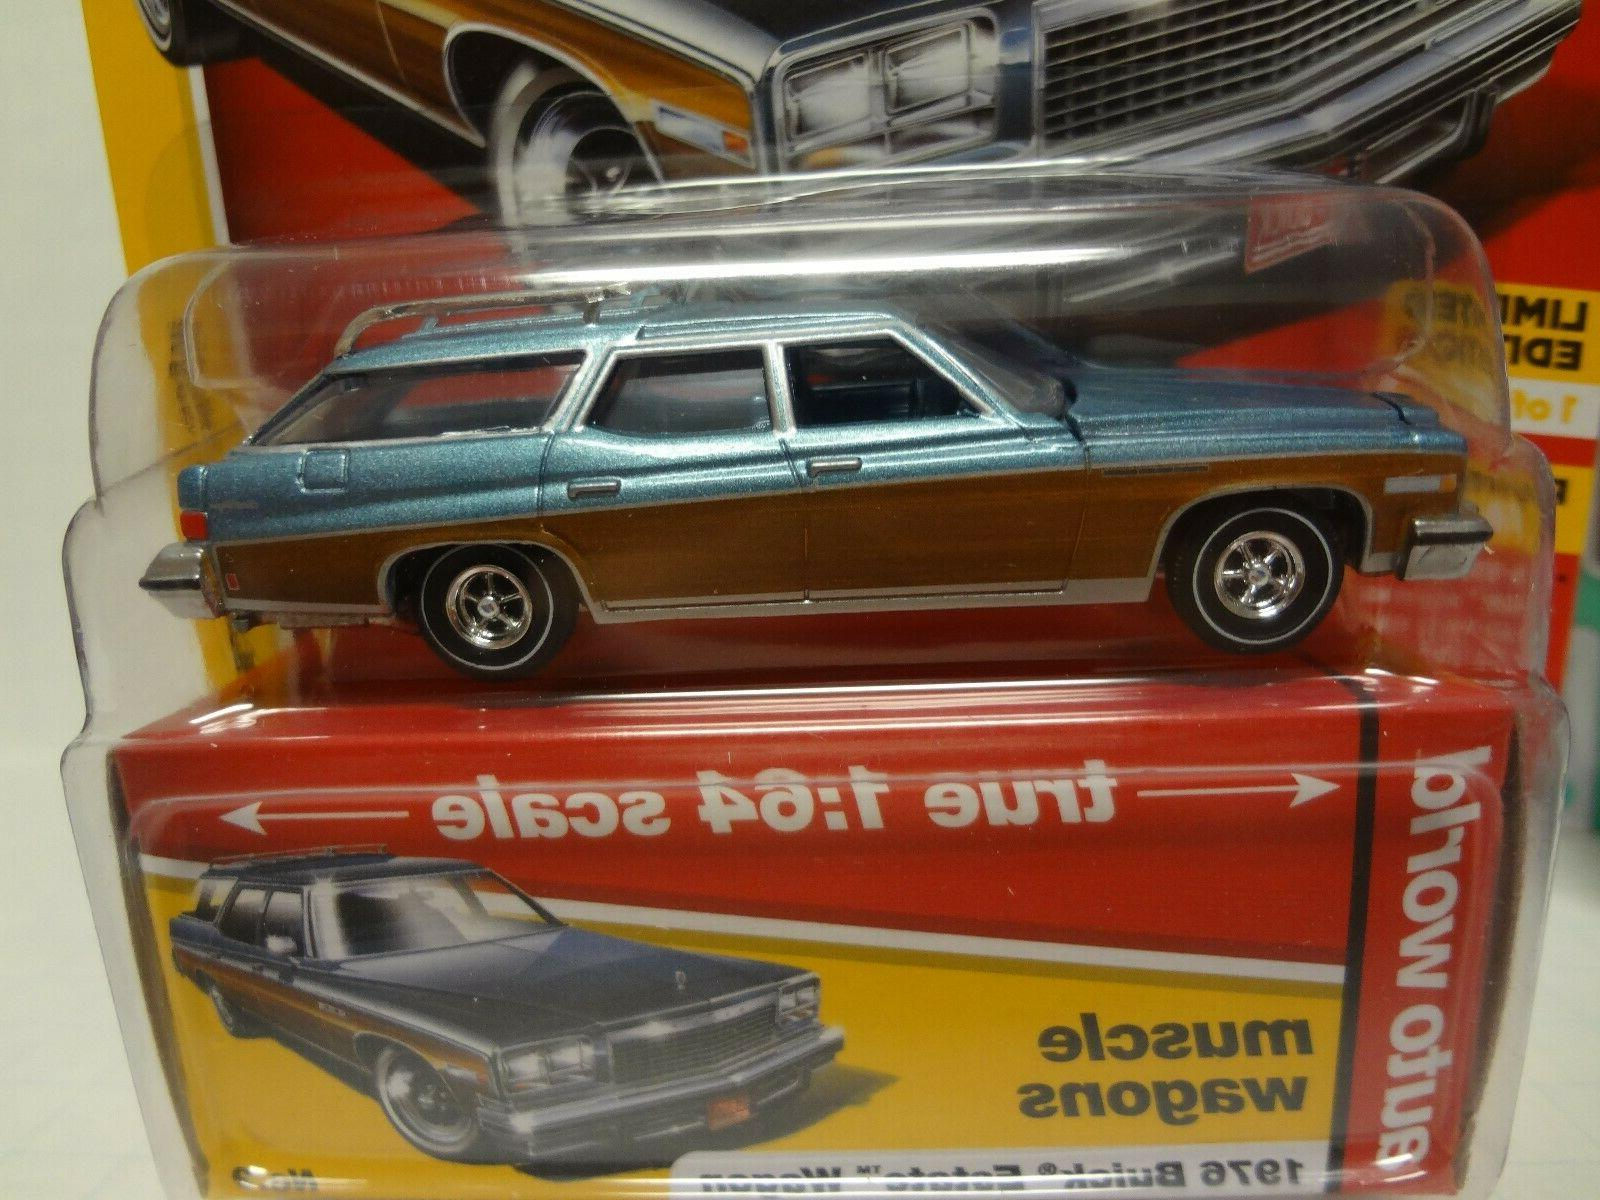 Auto Estate Wagon AW64212 of R1AB 19I